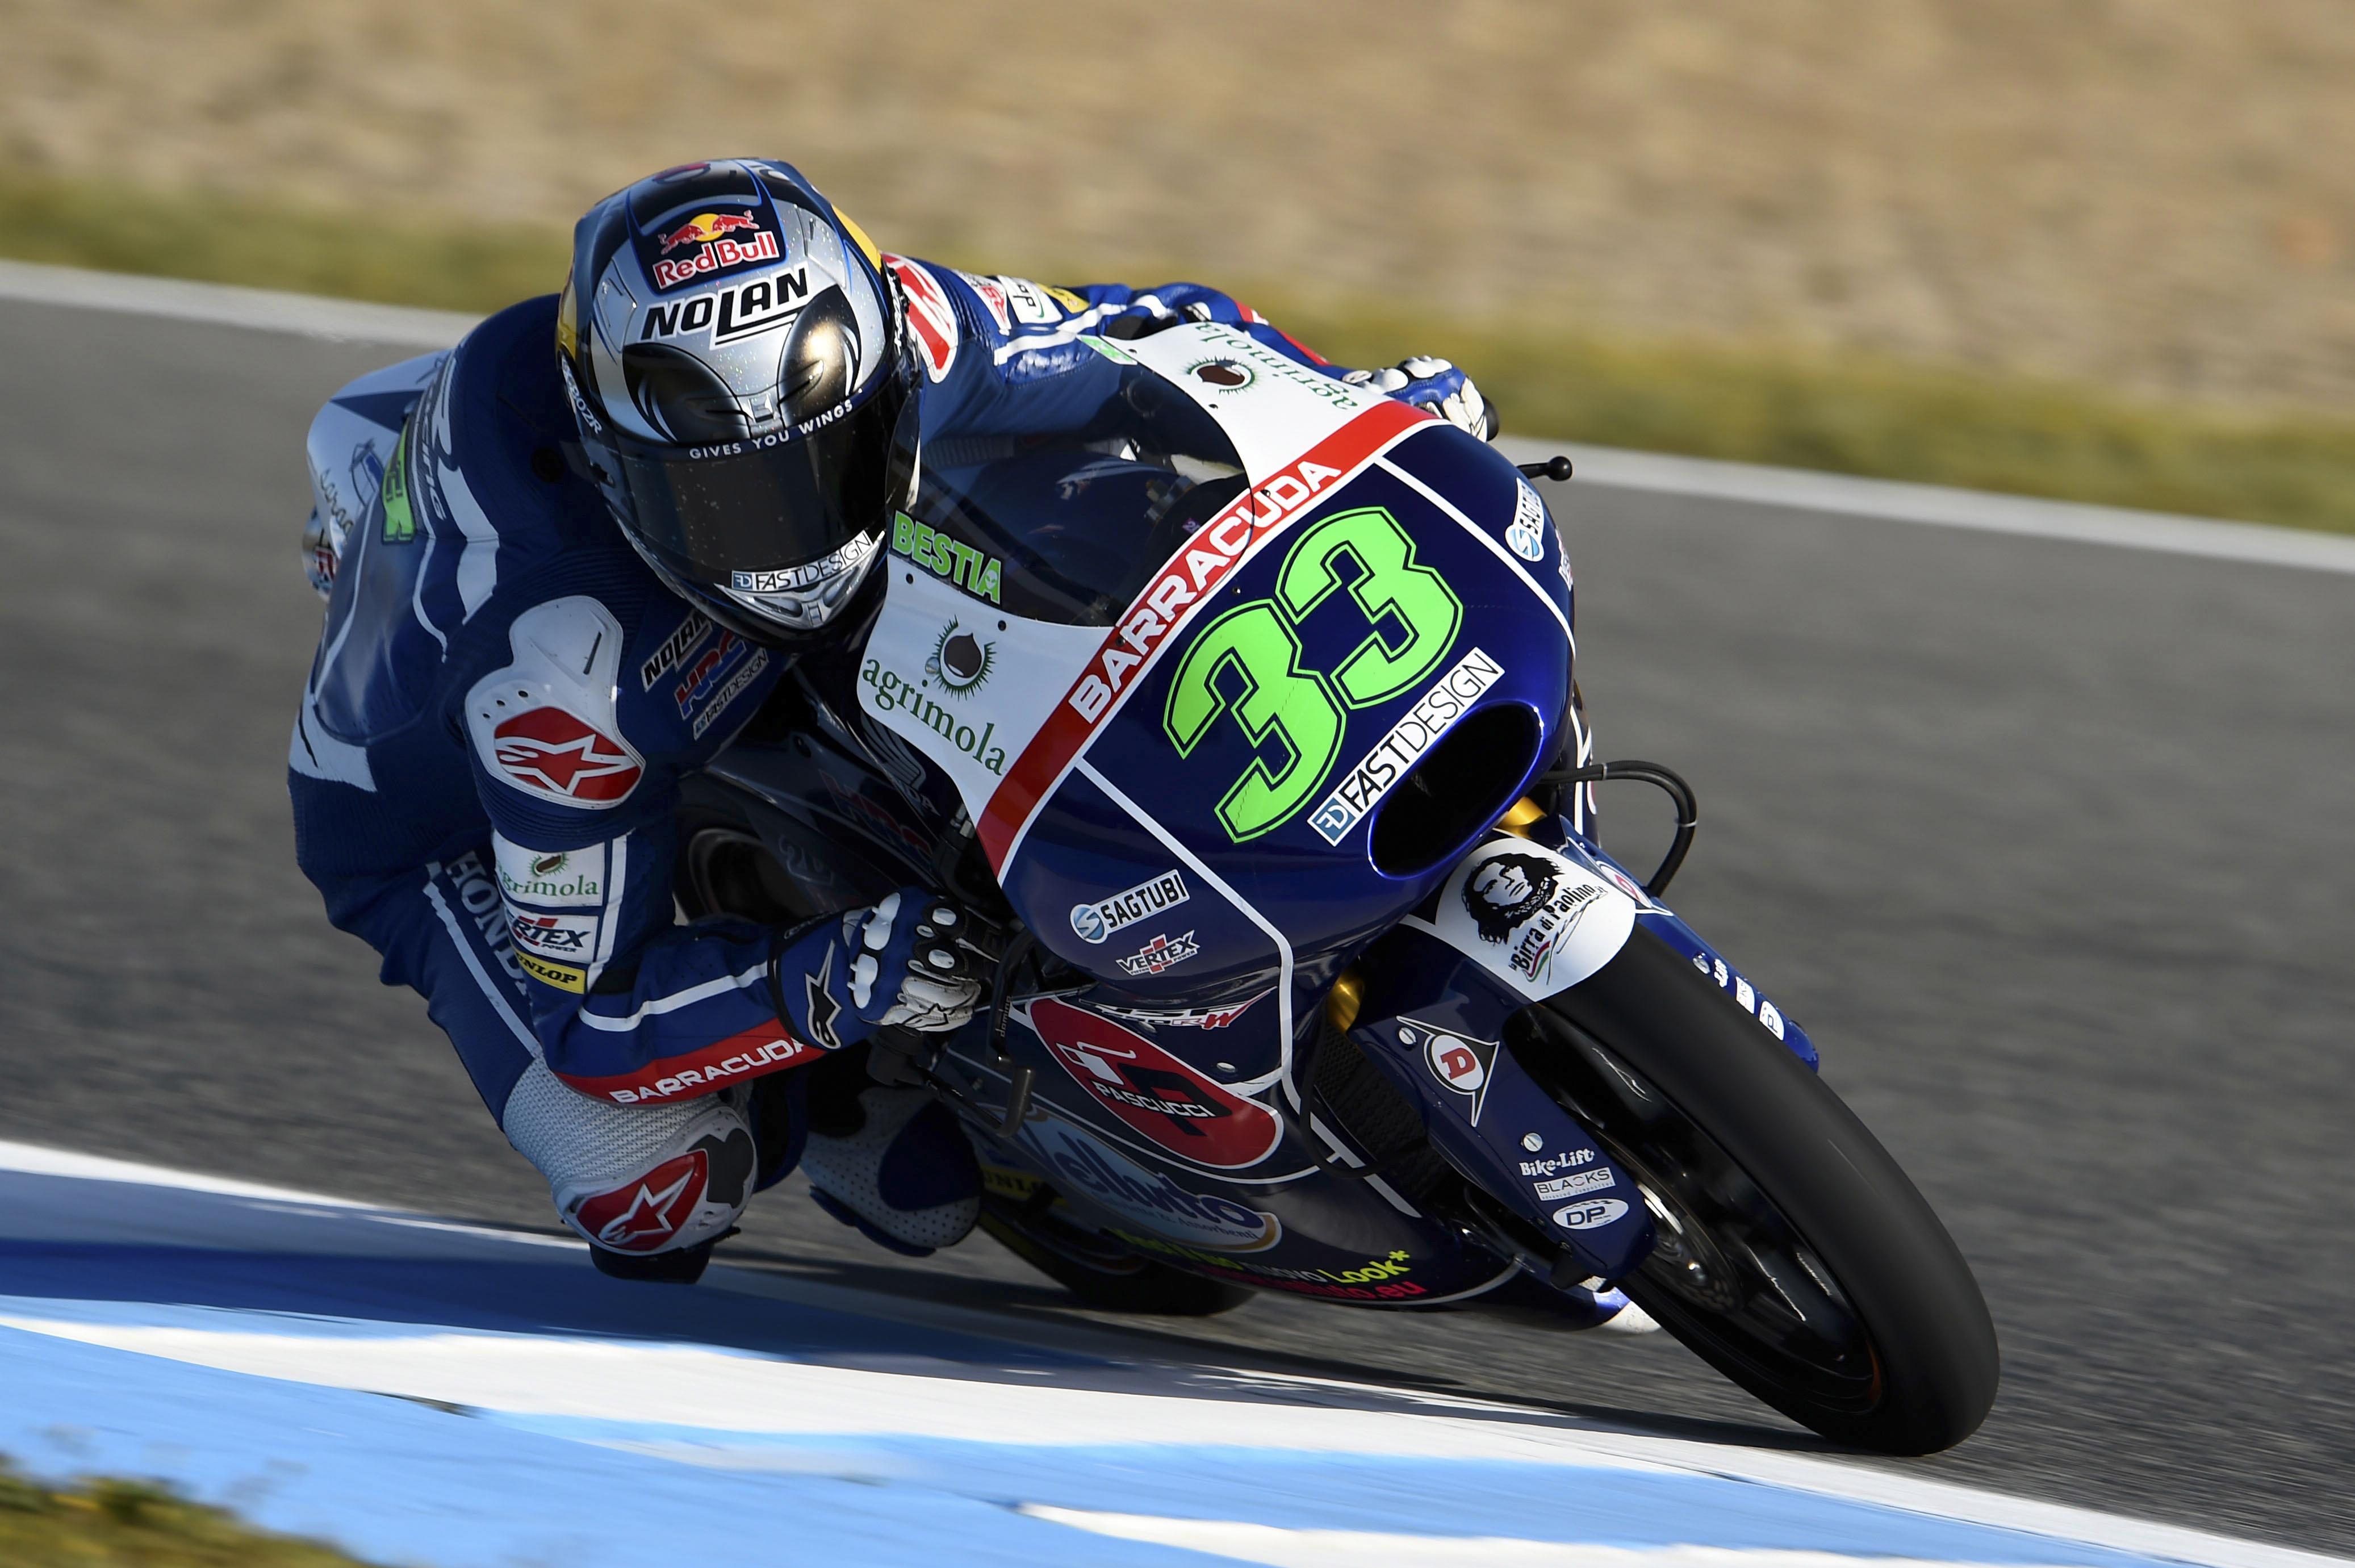 Enea Bastianini Moto3 intervista